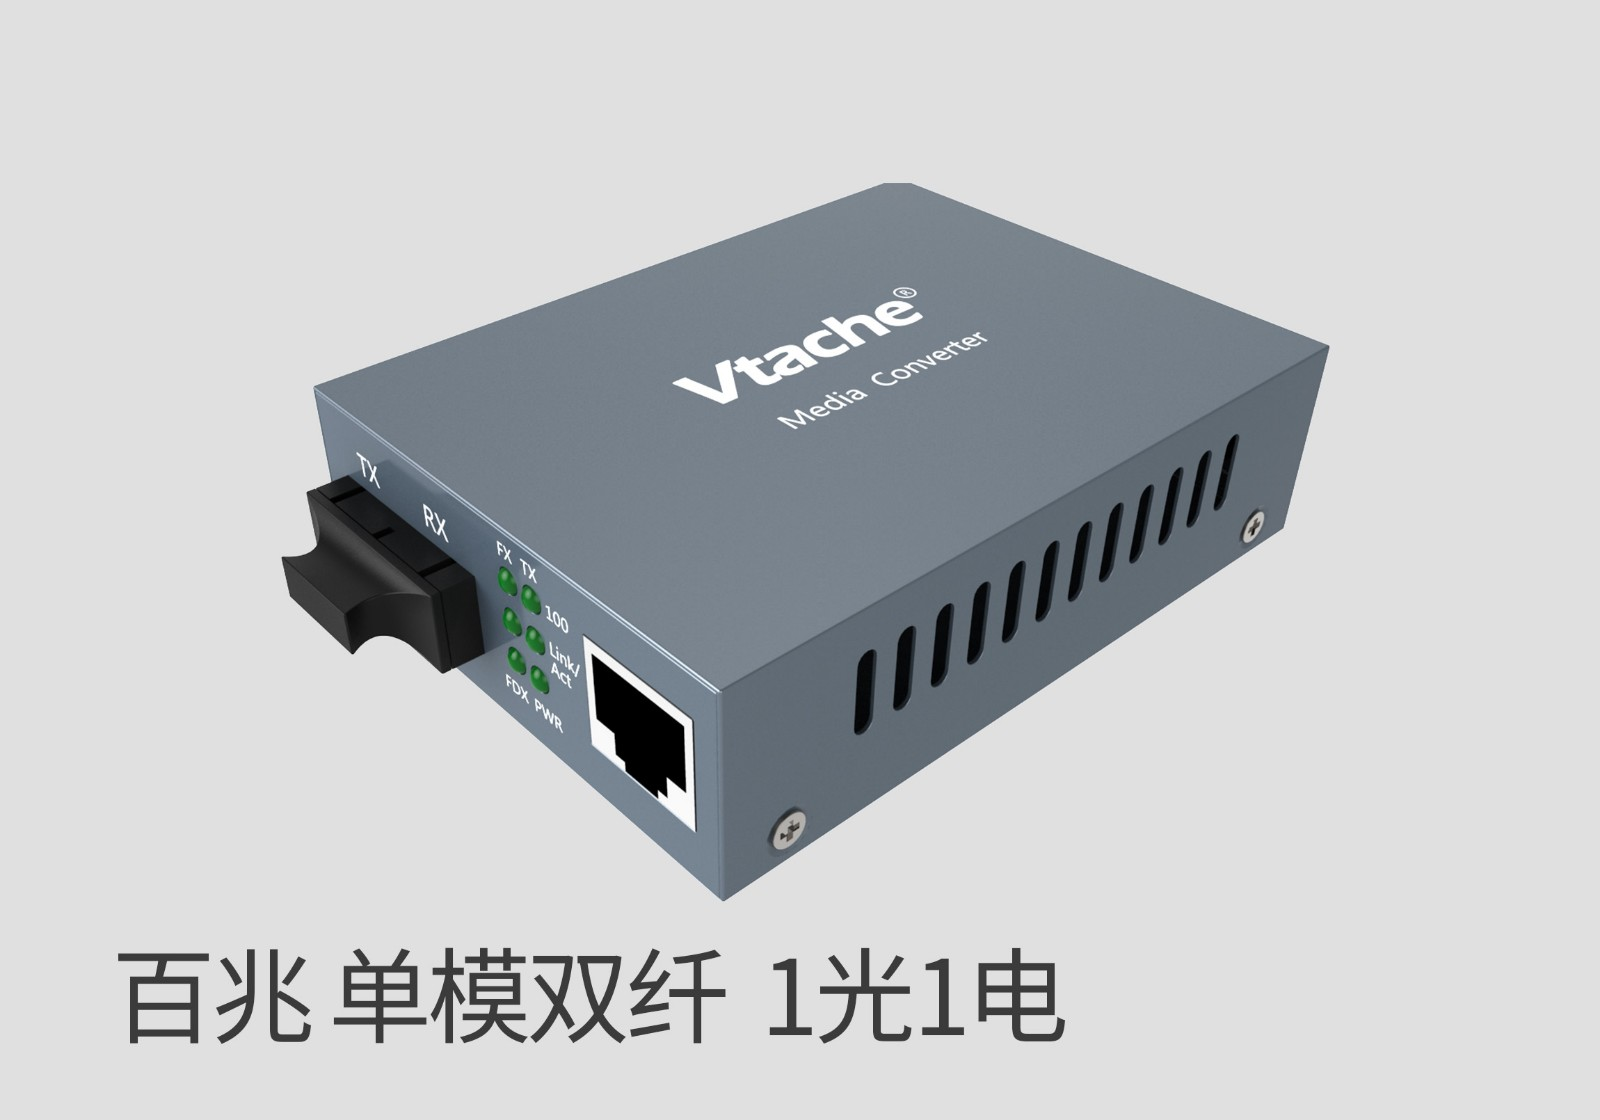 VT-FE611-20